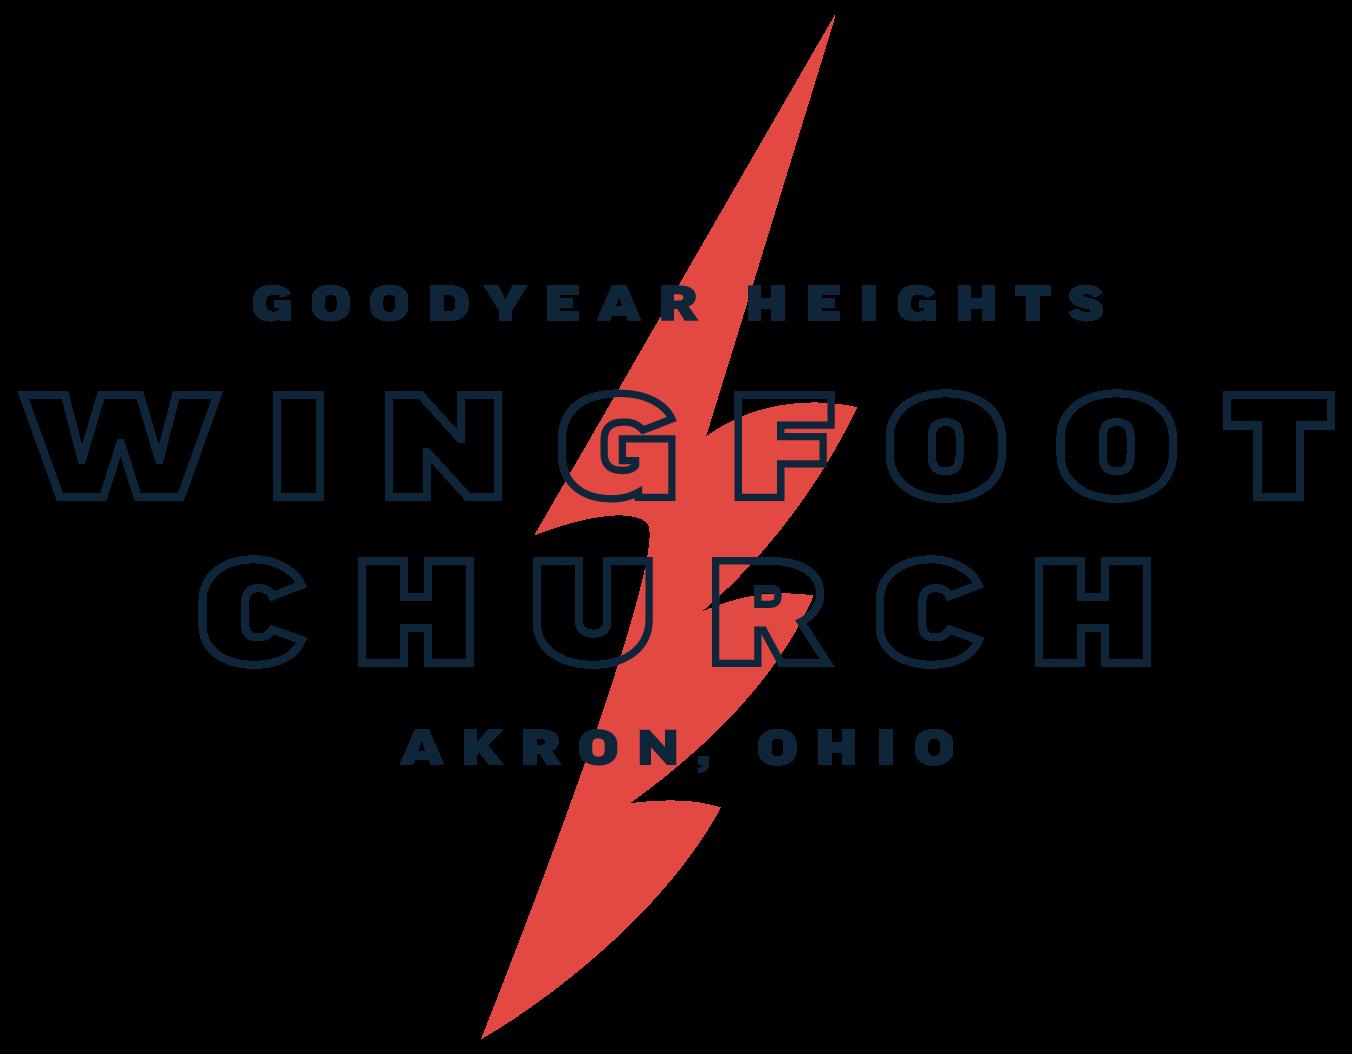 Wingfoot Church // Goodyear Heights Akron, Ohio